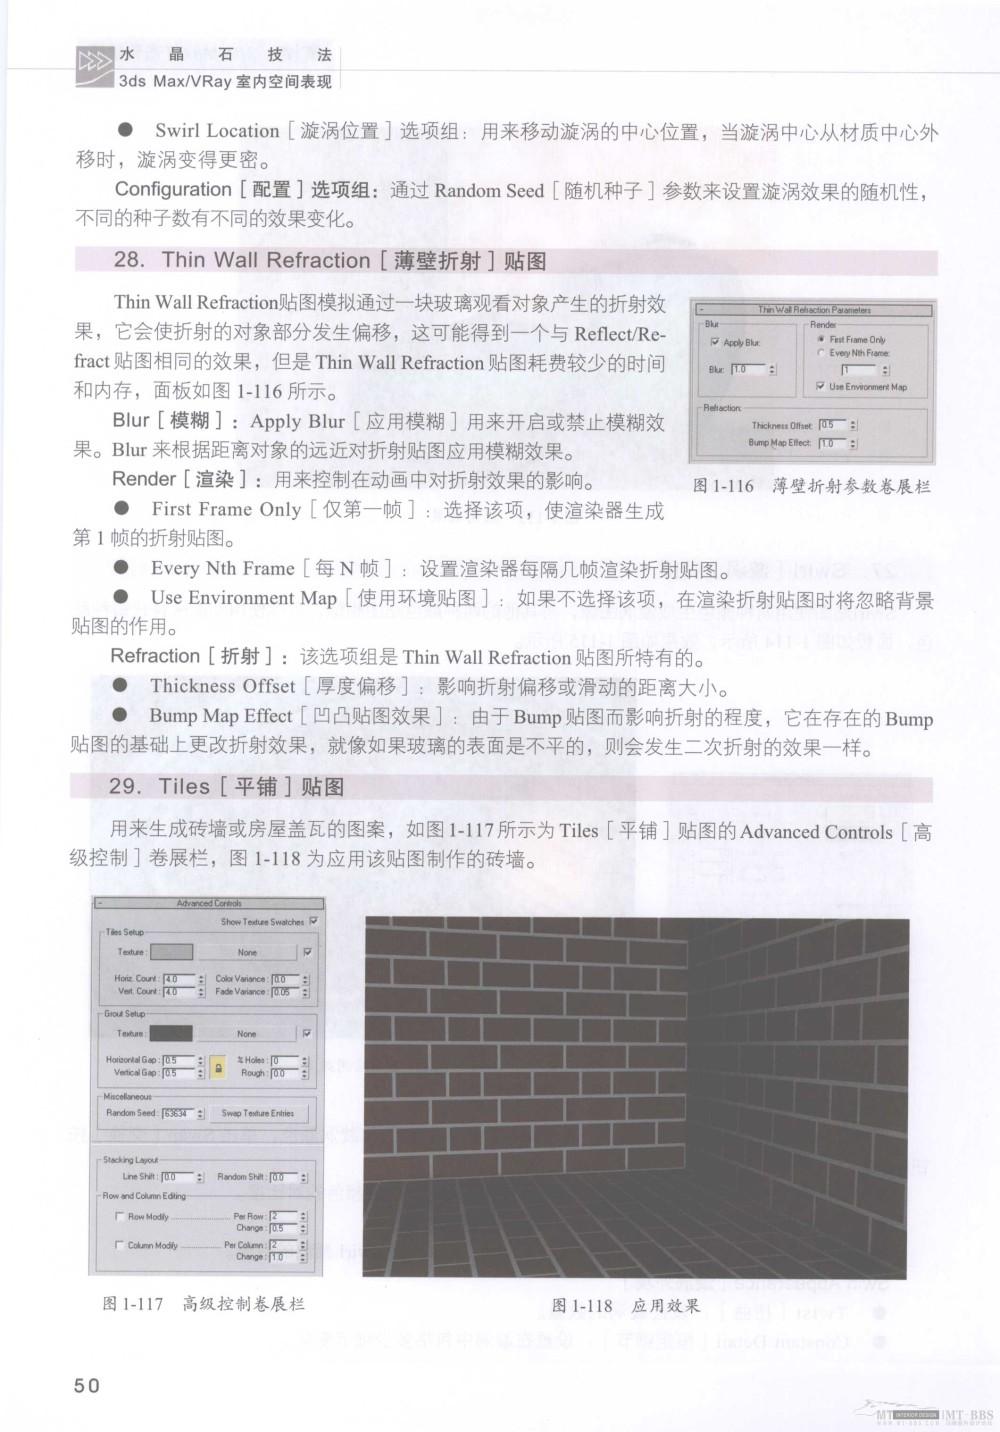 水晶石技法-3ds_Max&VRay室内空间表现_水晶石技法-3ds_Max&VRay室内空间表现_页面_056.jpg